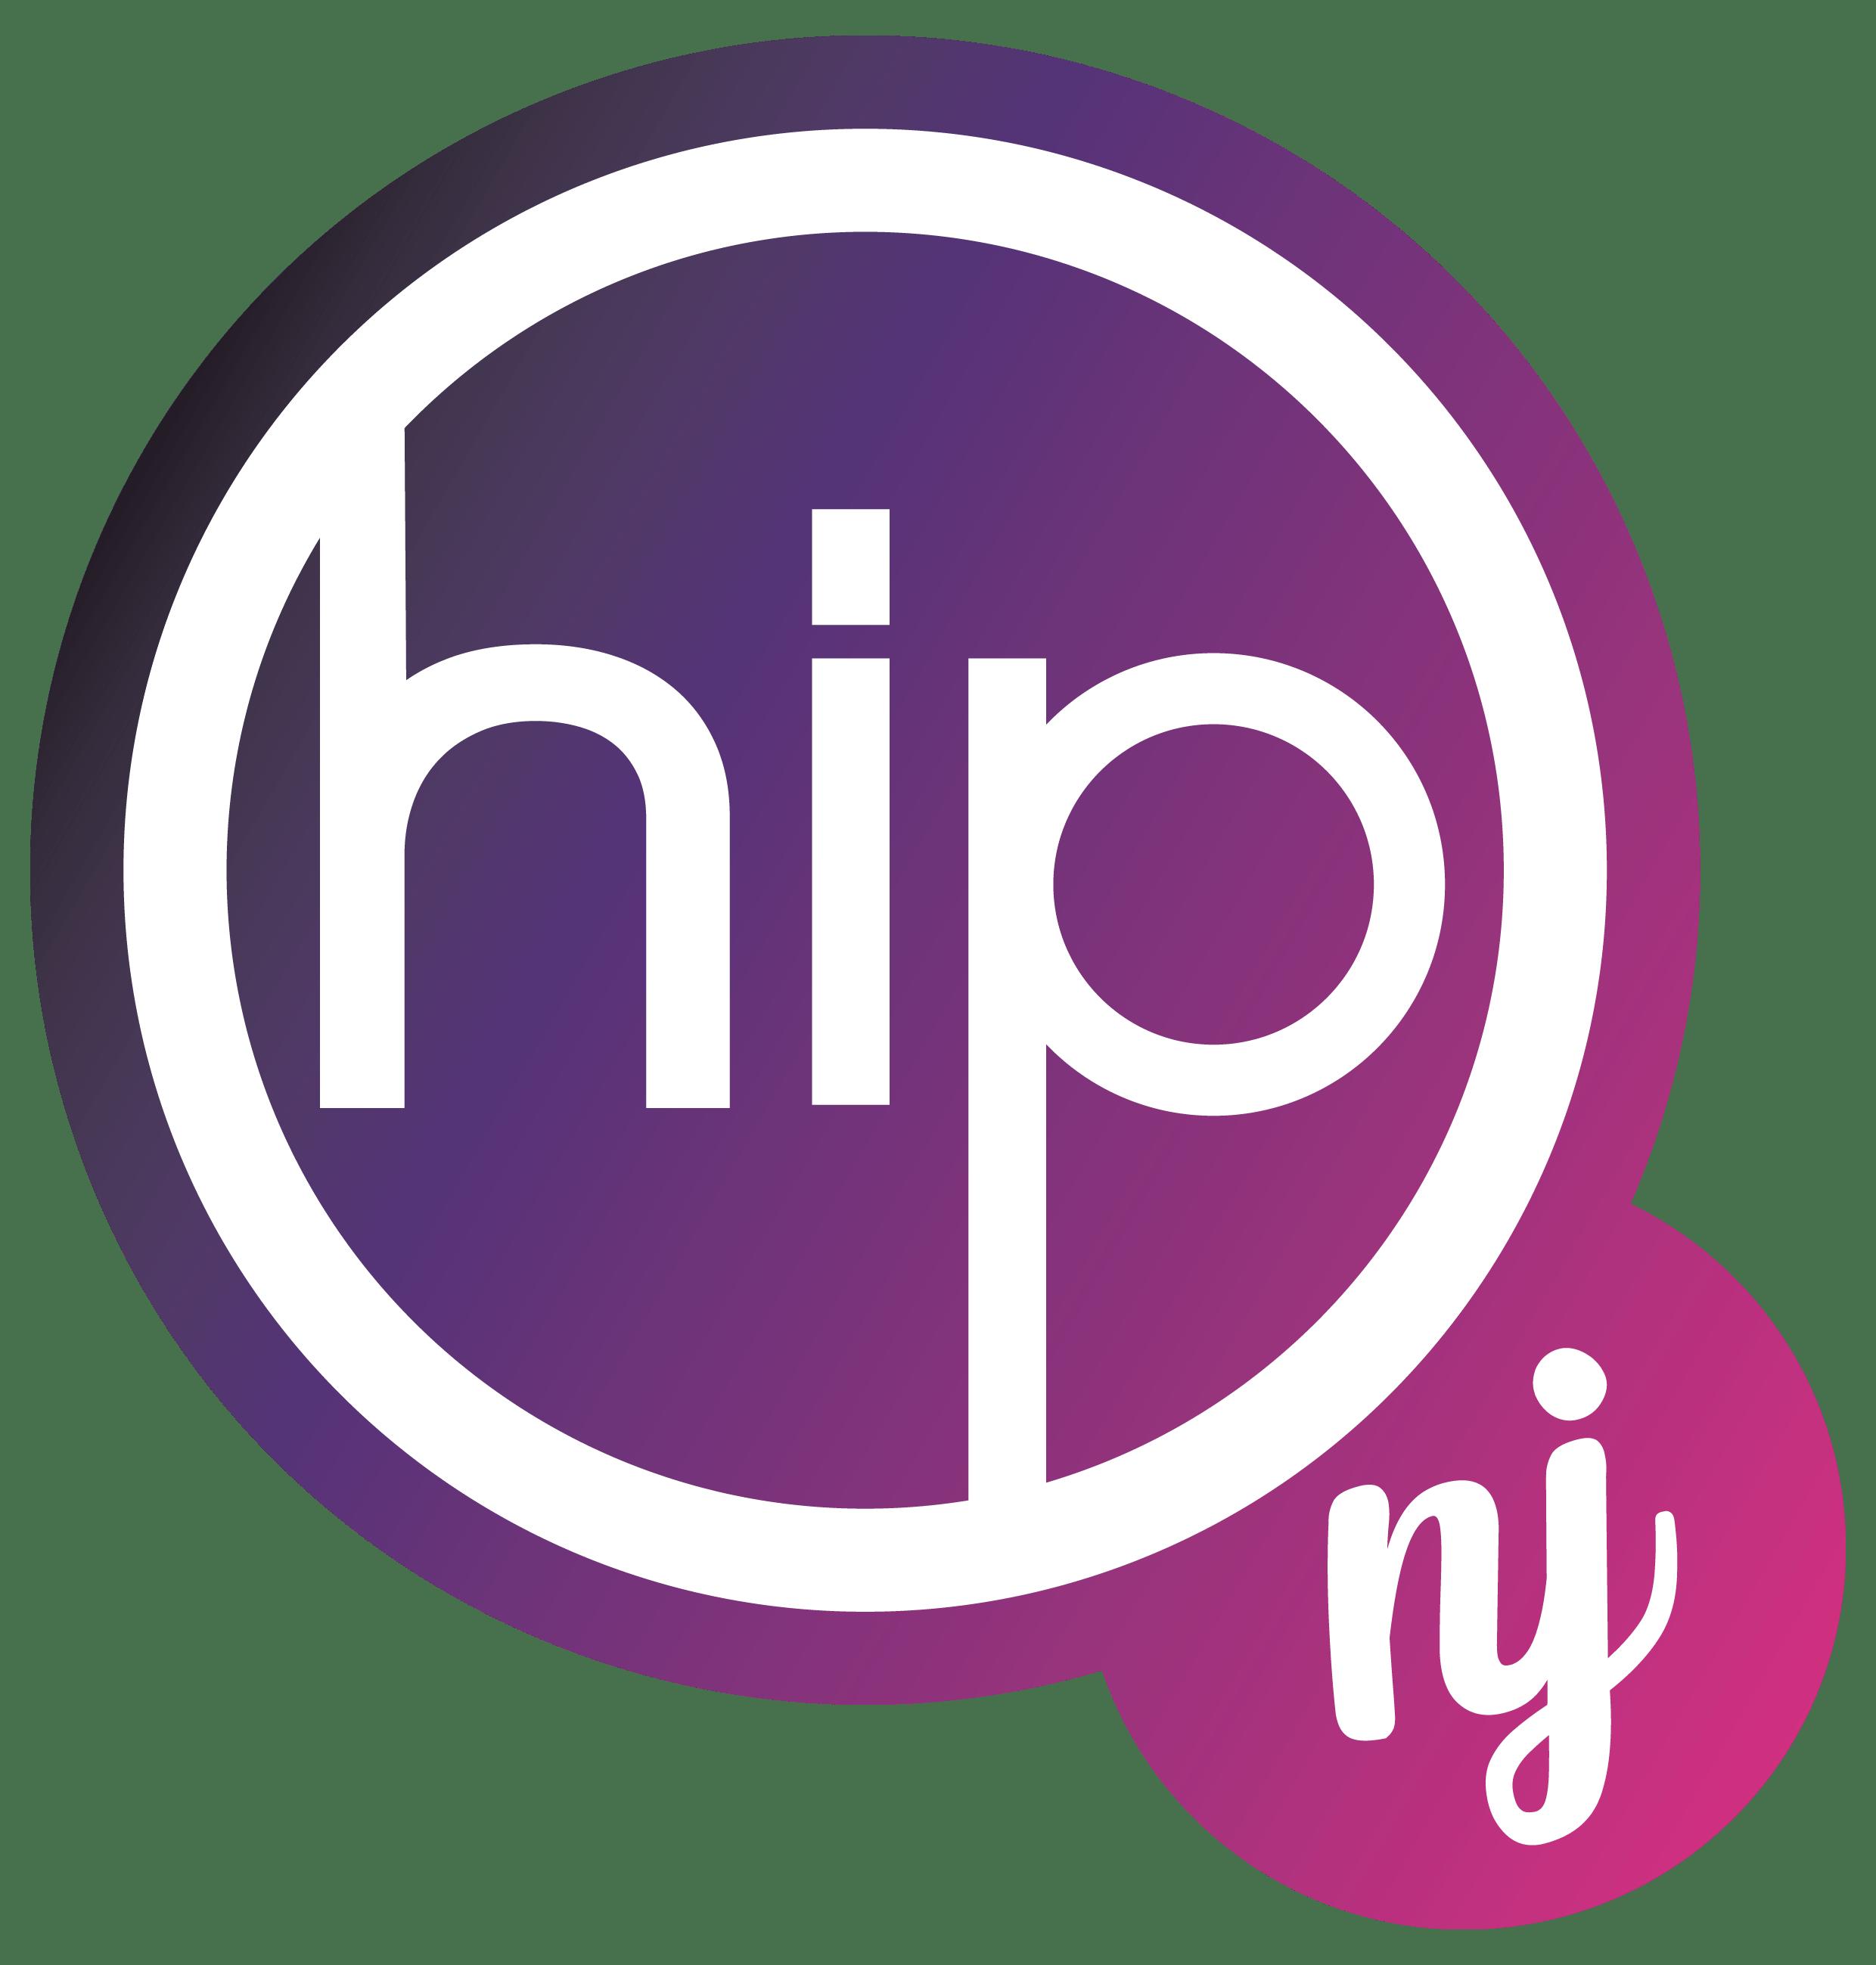 hipnj_logo_2020